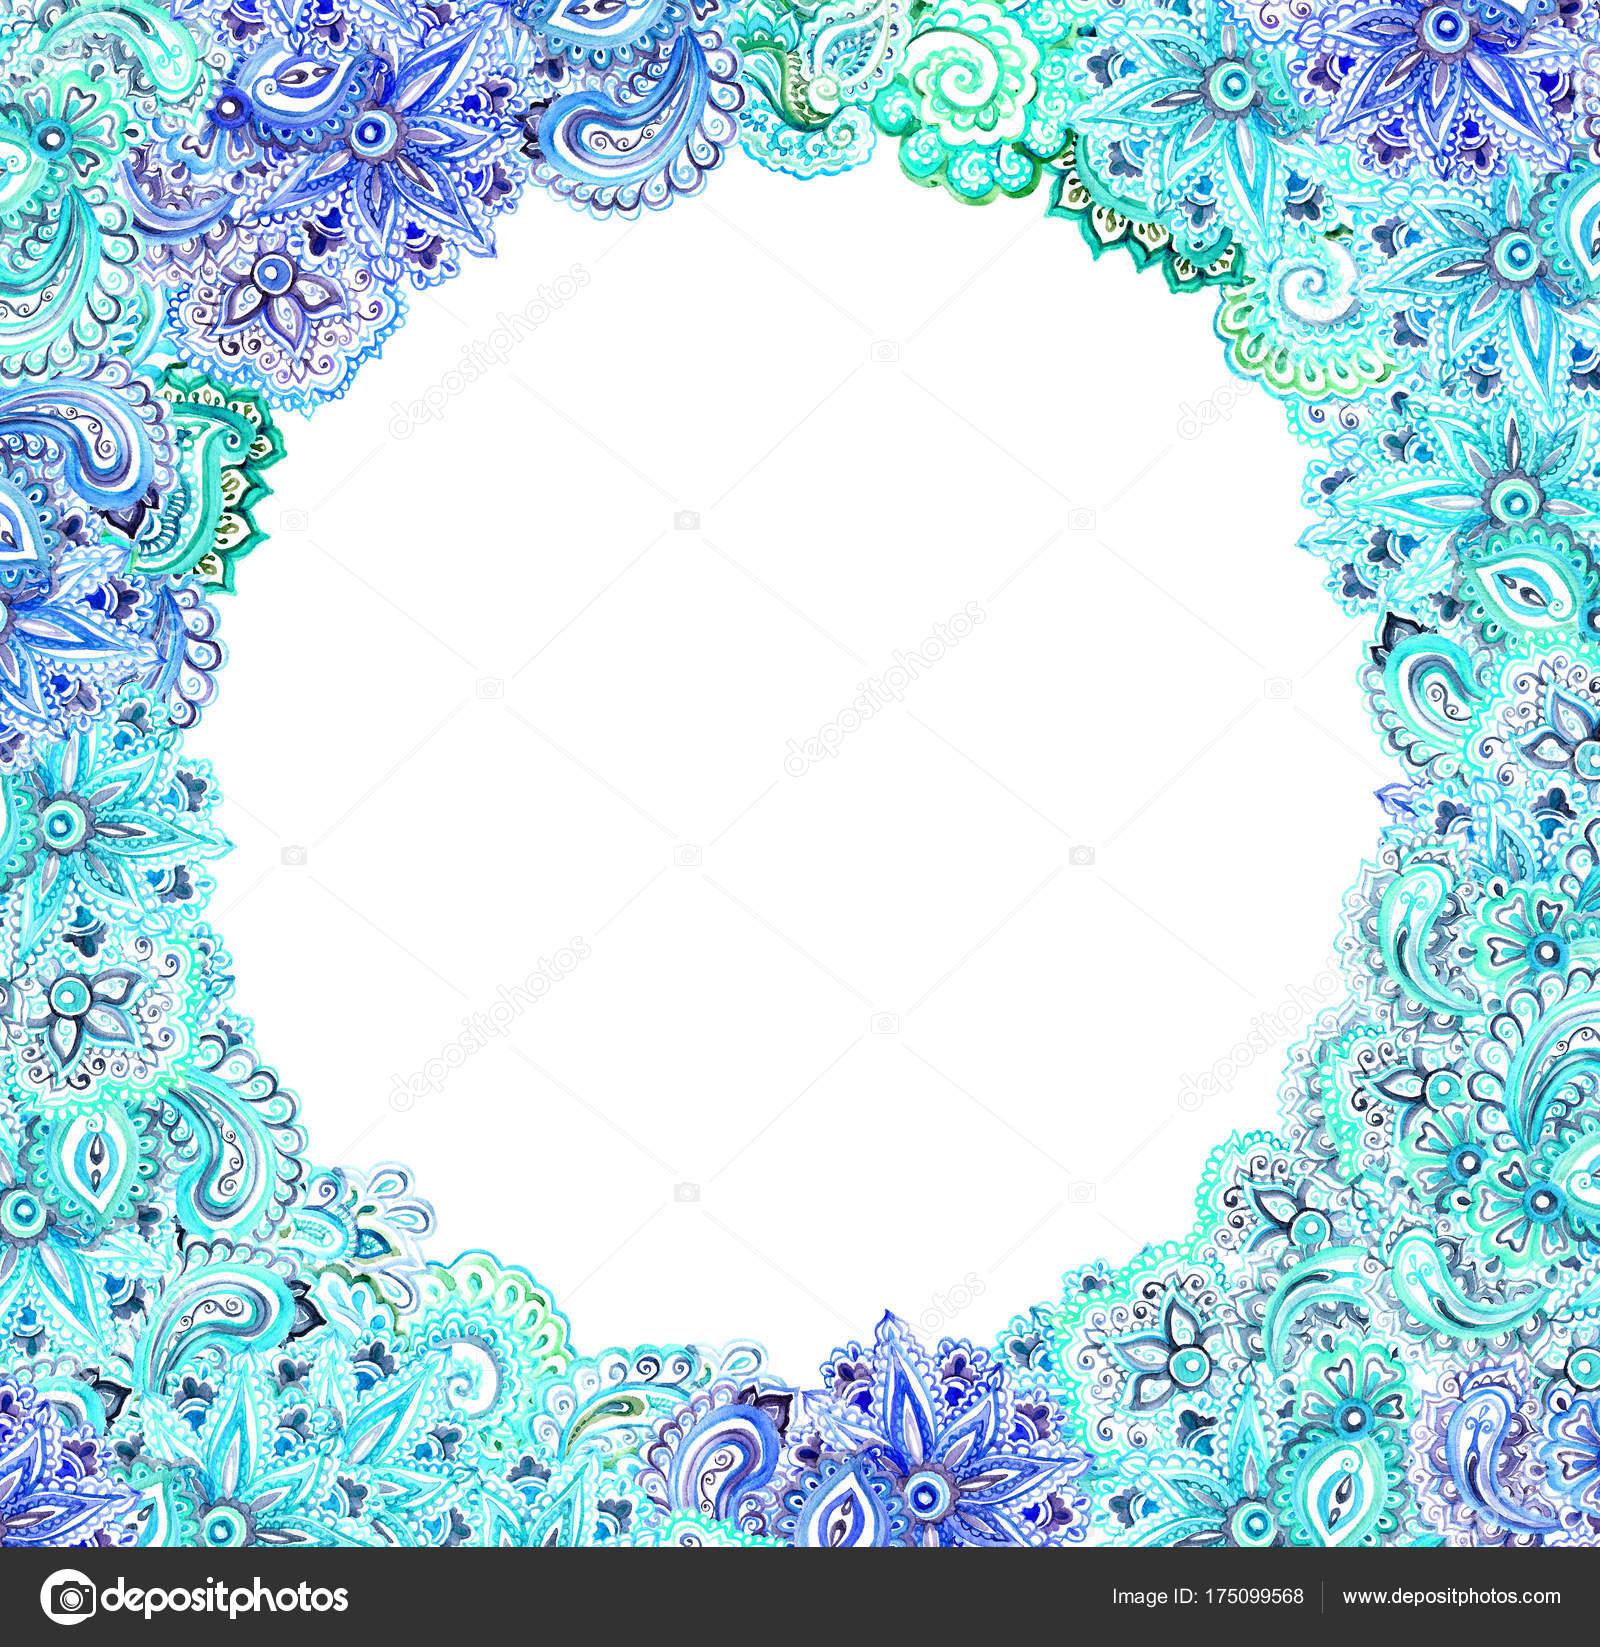 Tarjeta de mar ornamentales - diseño ornamental vintage. Marco de ...